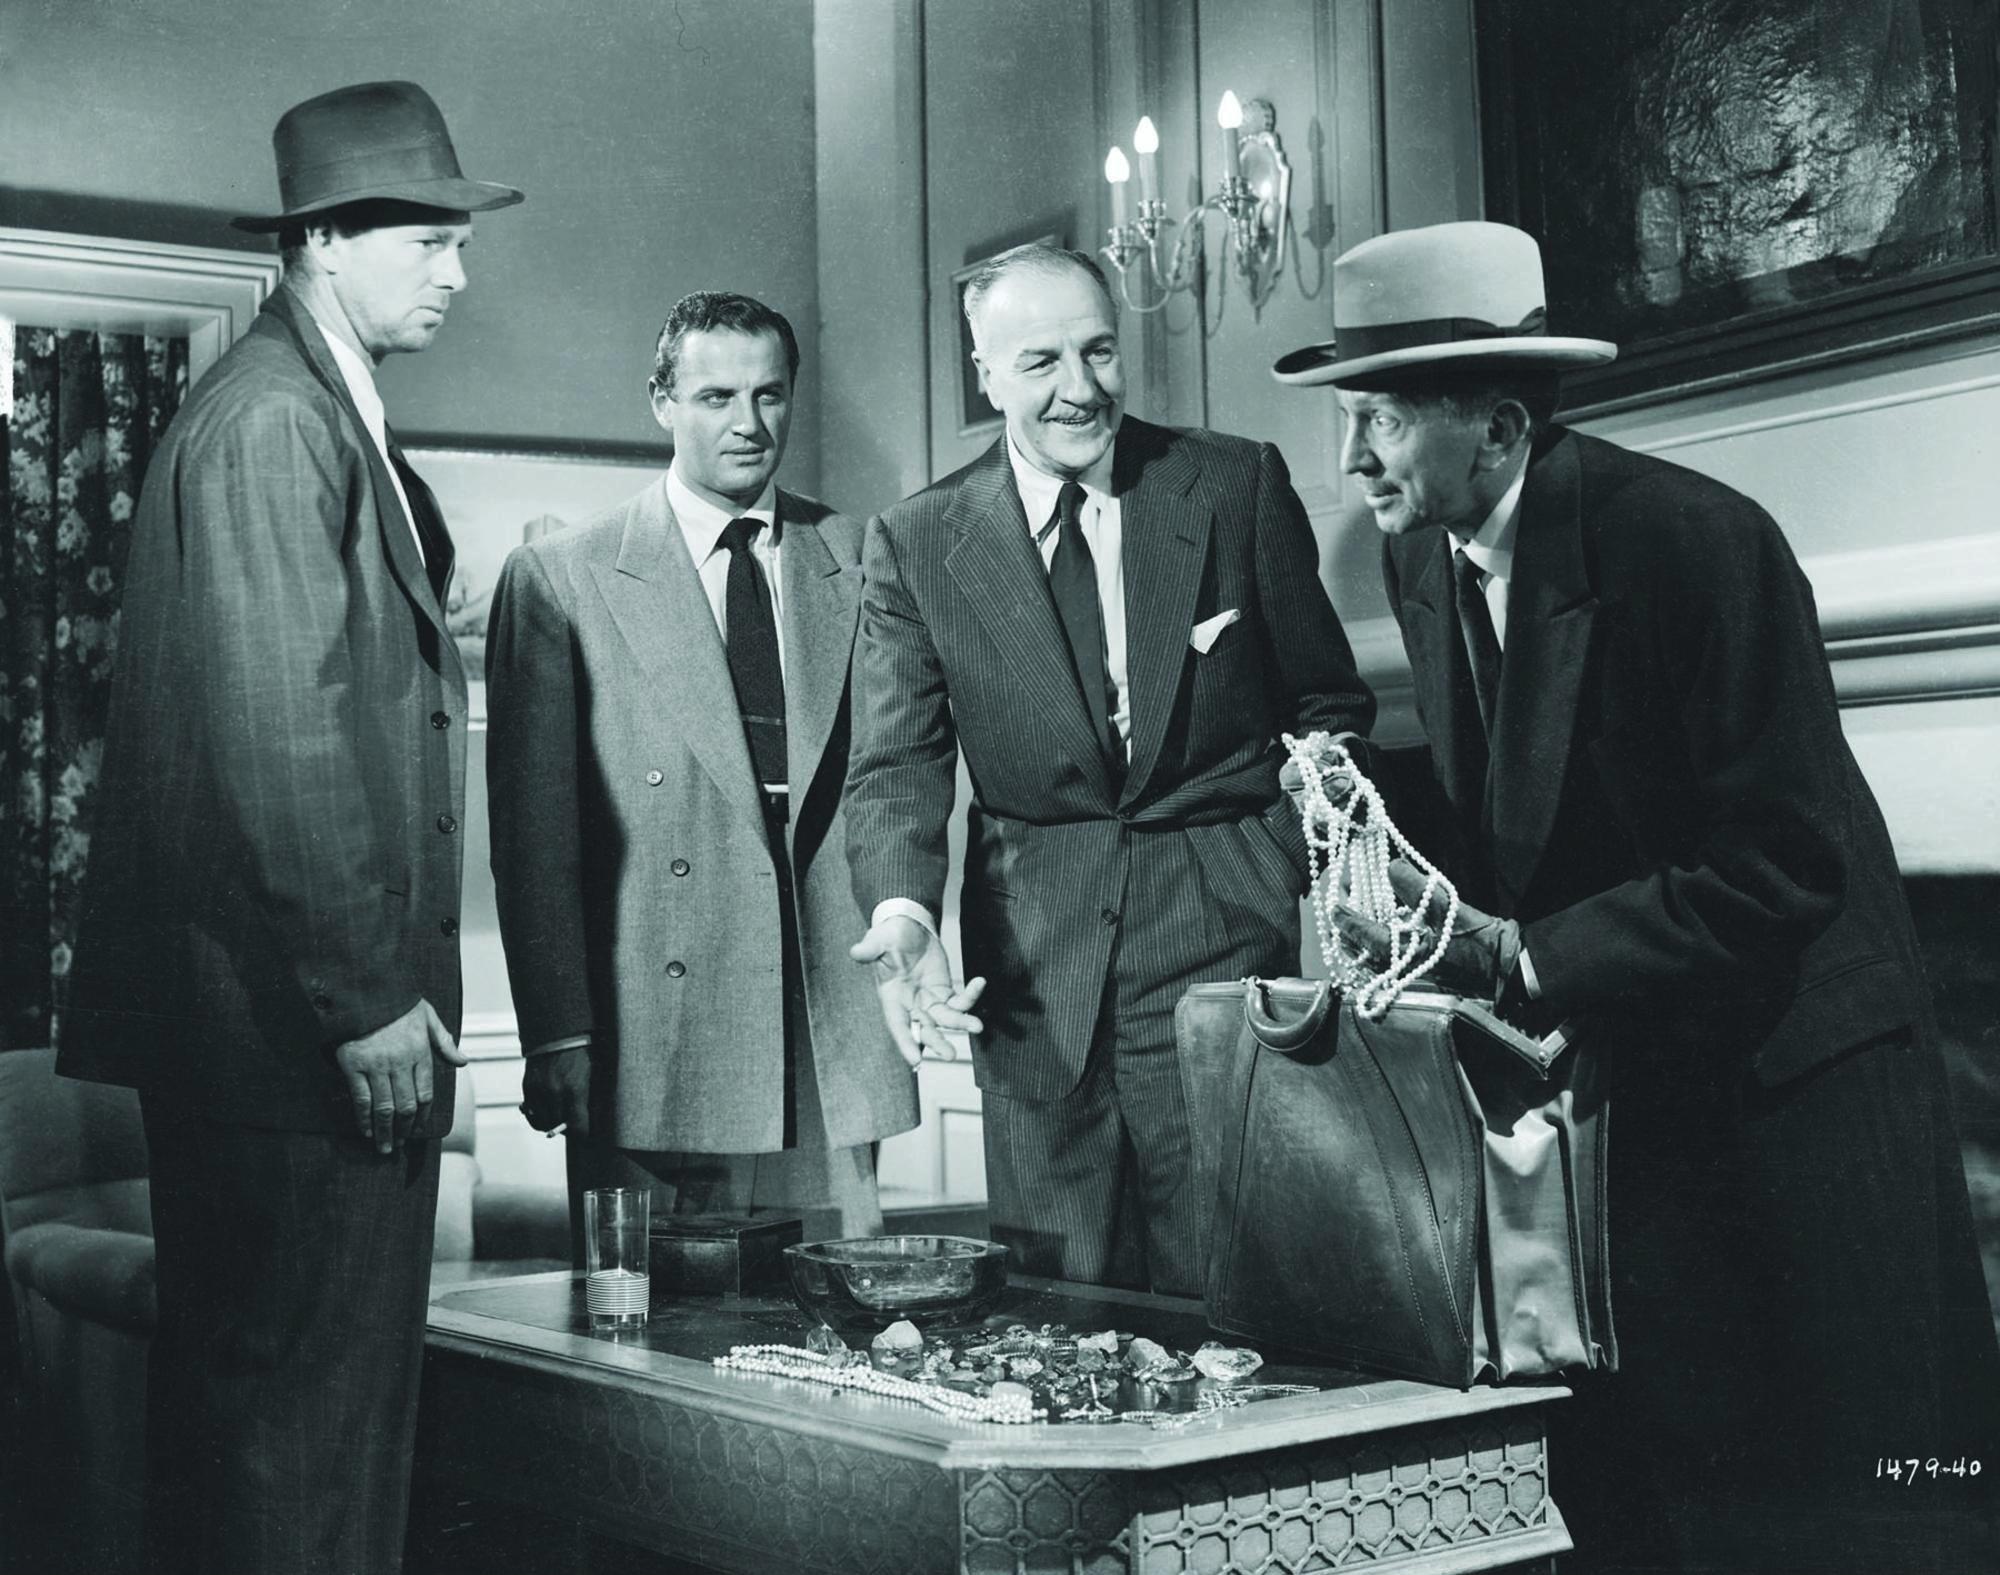 Sterling Hayden, Louis Calhern, Brad Dexter, and Sam Jaffe in The Asphalt Jungle (1950)